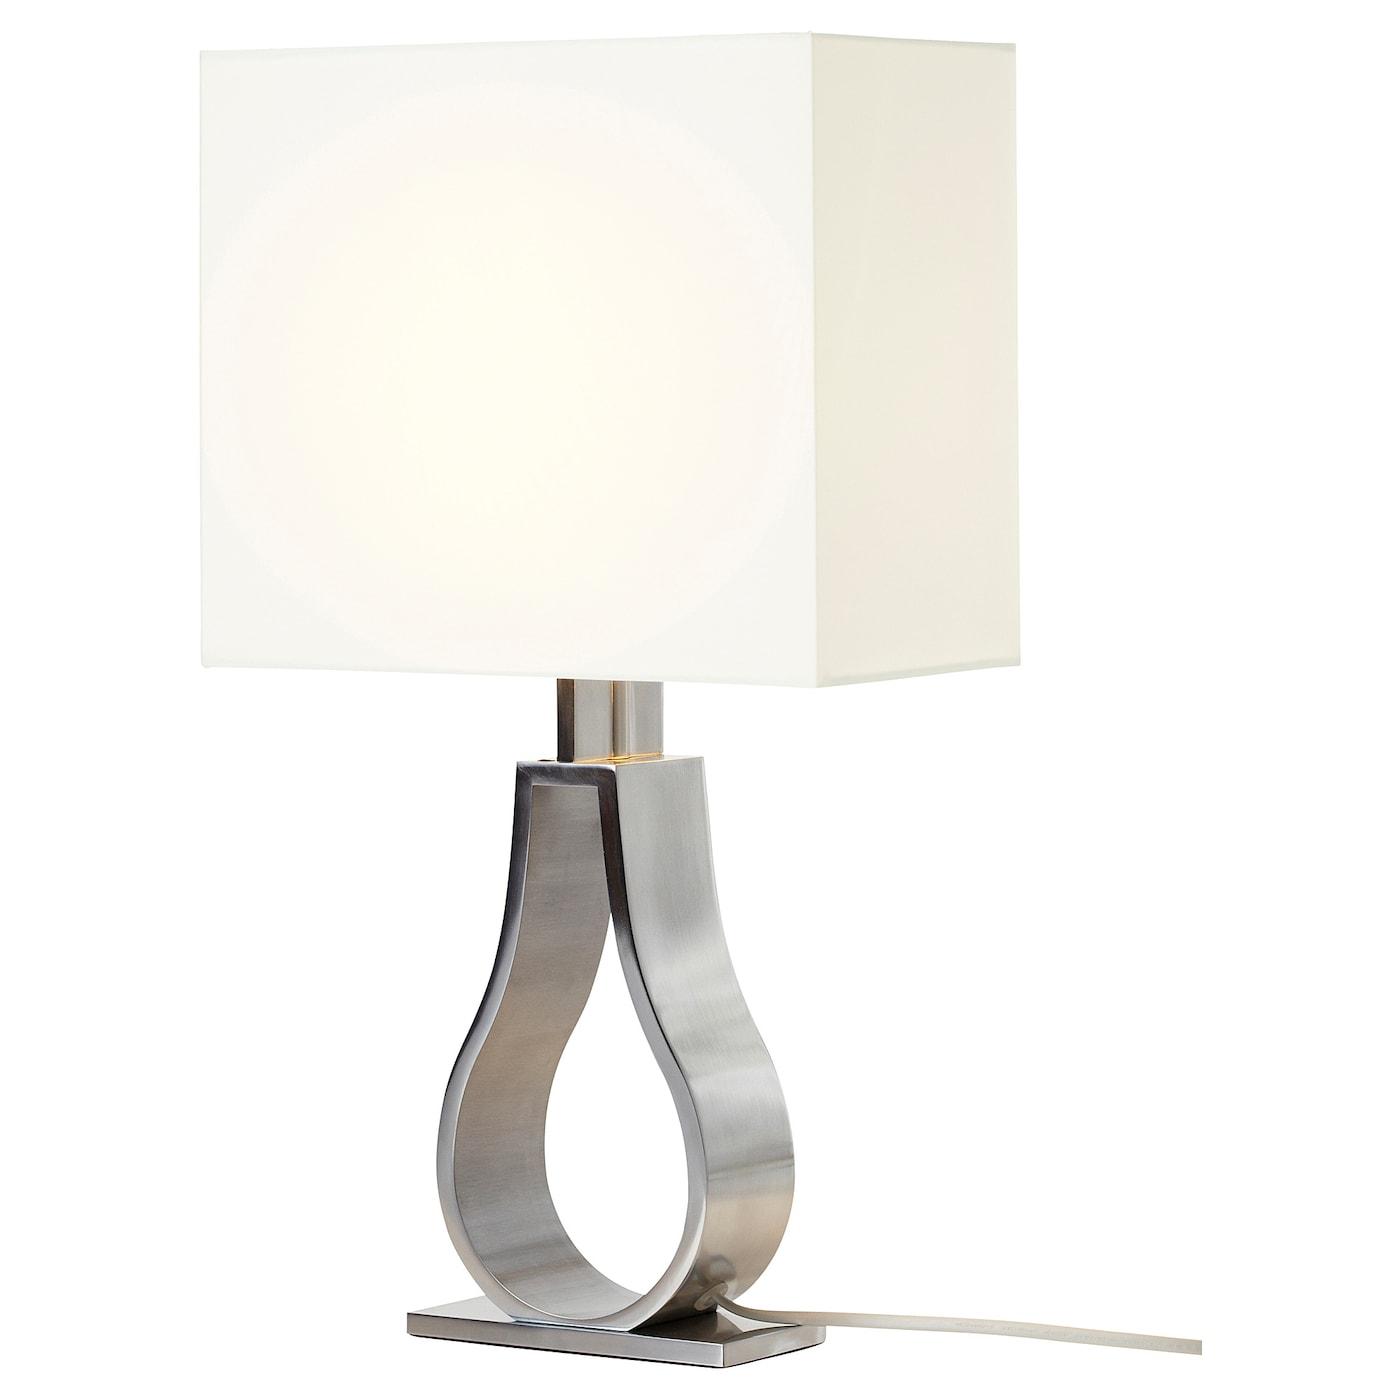 nonopklabb gulvlampe offwhite